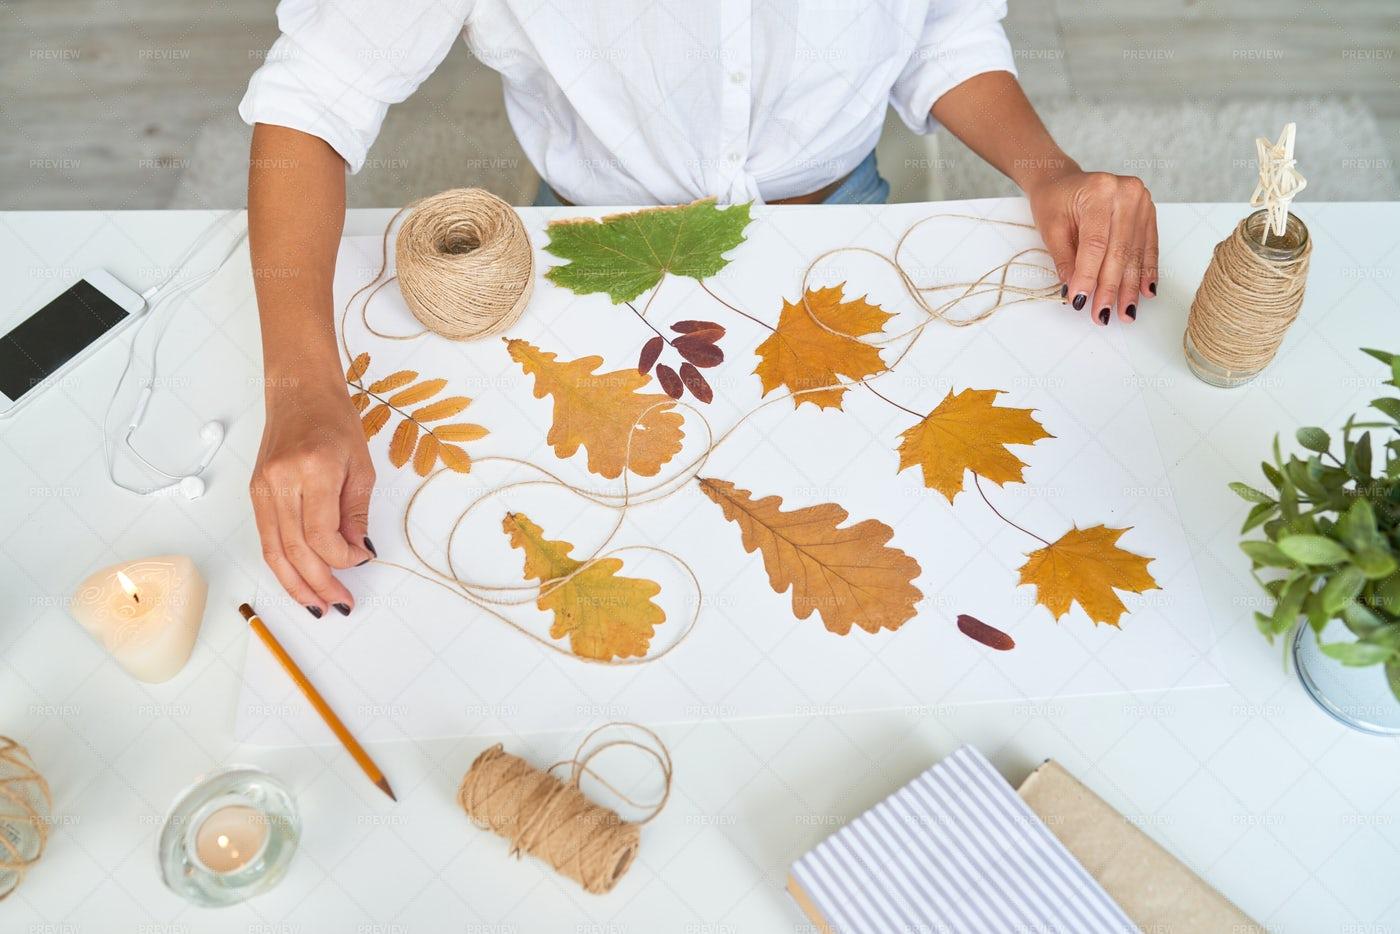 Designer Making Handmade Autumn...: Stock Photos